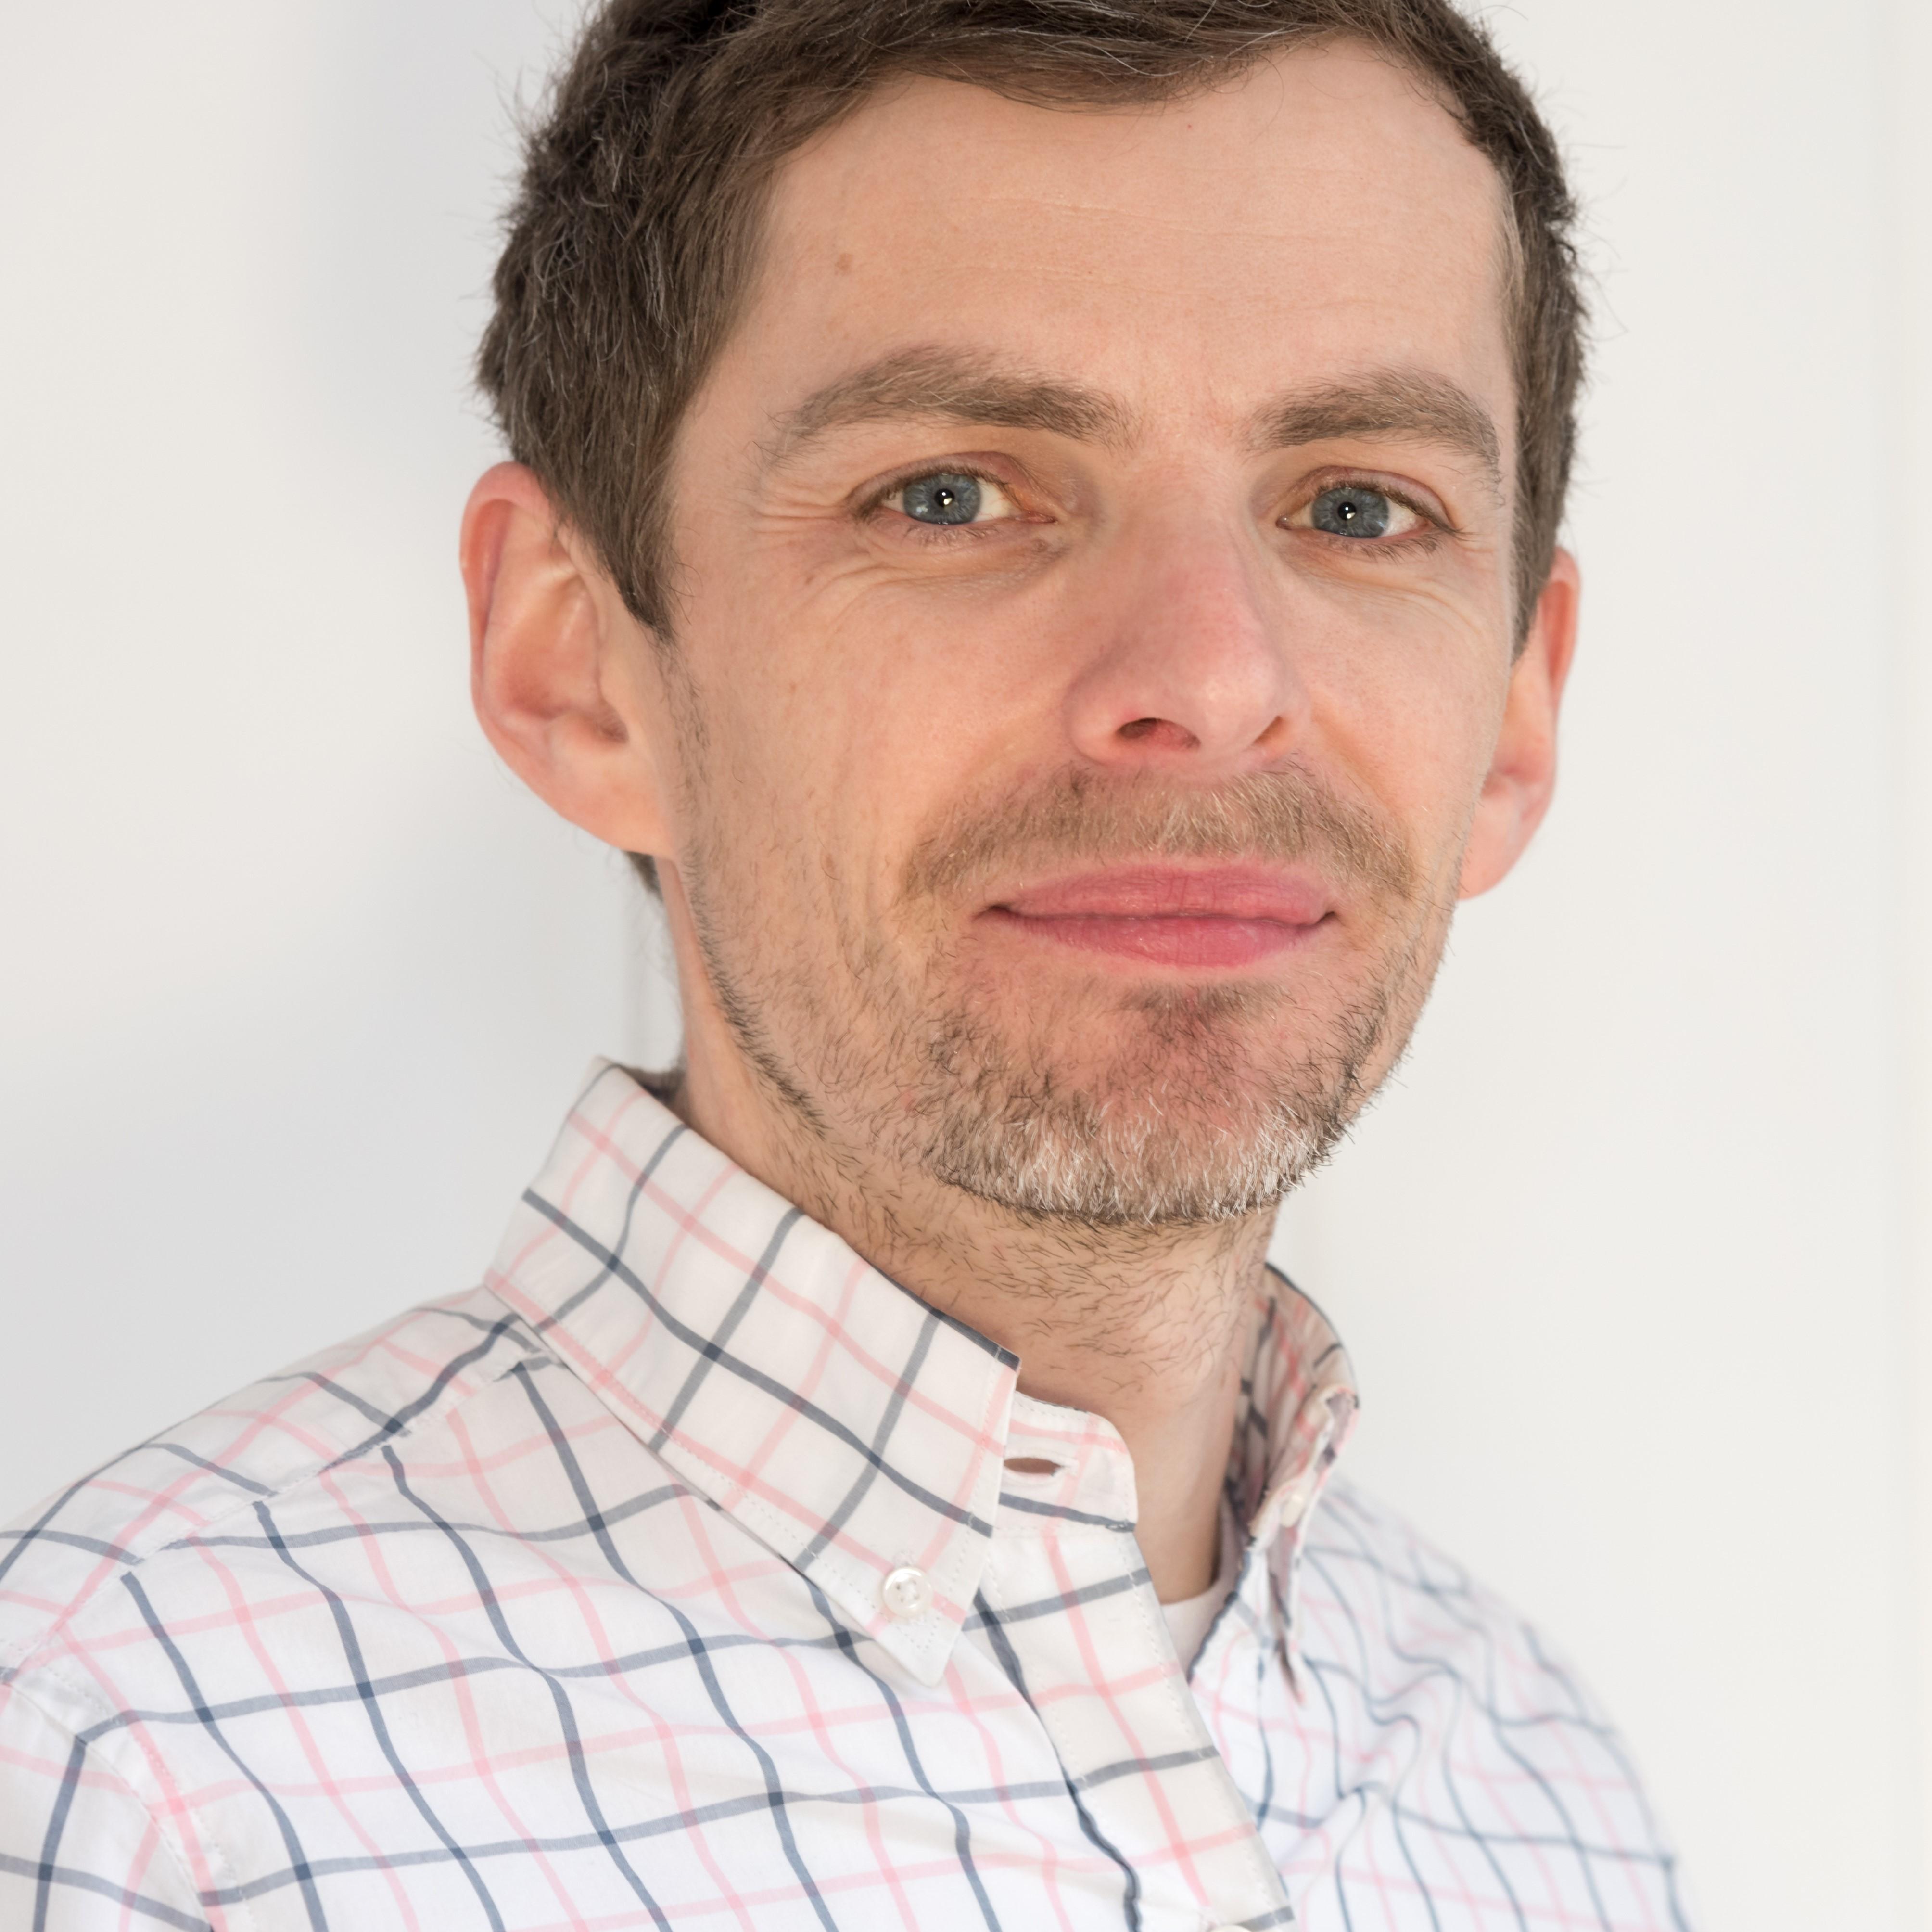 Paul Craddock, PhD, SPWLA